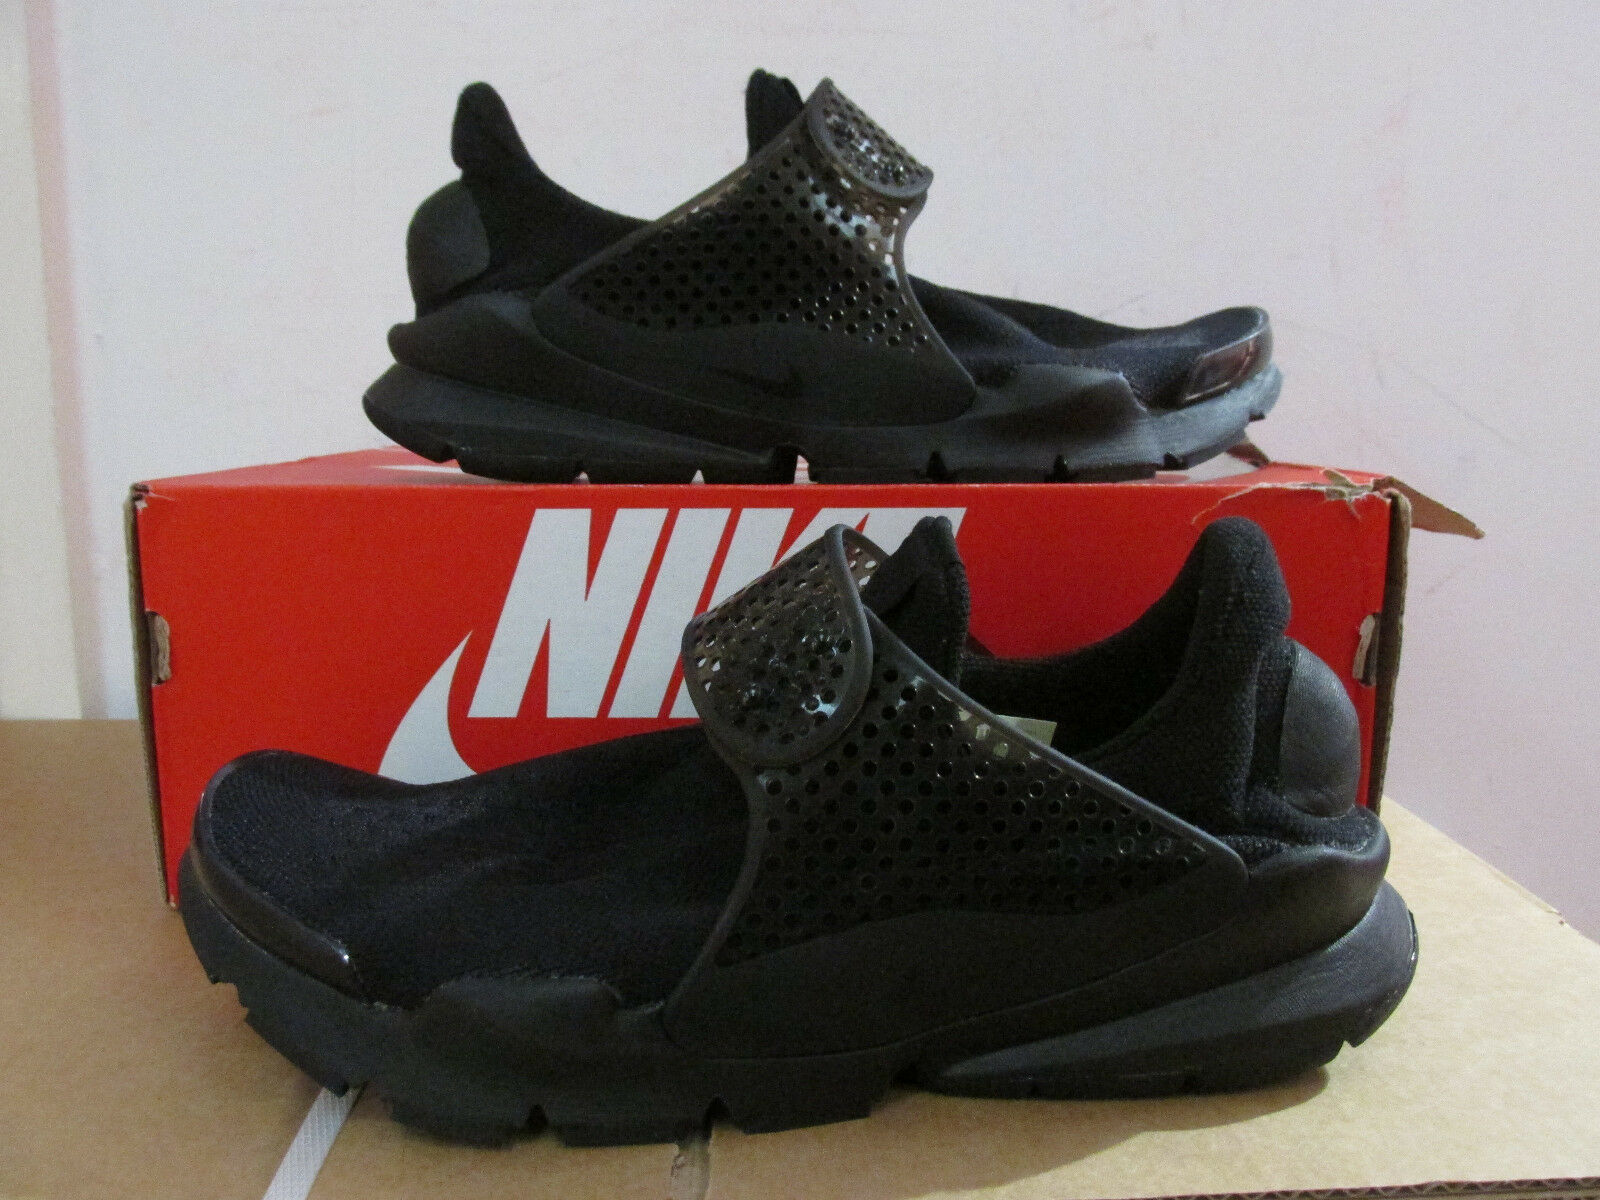 Nike Calze Dart Scarpe Uomo da Corsa 819686 001 Scarpe da Tennis Svendita